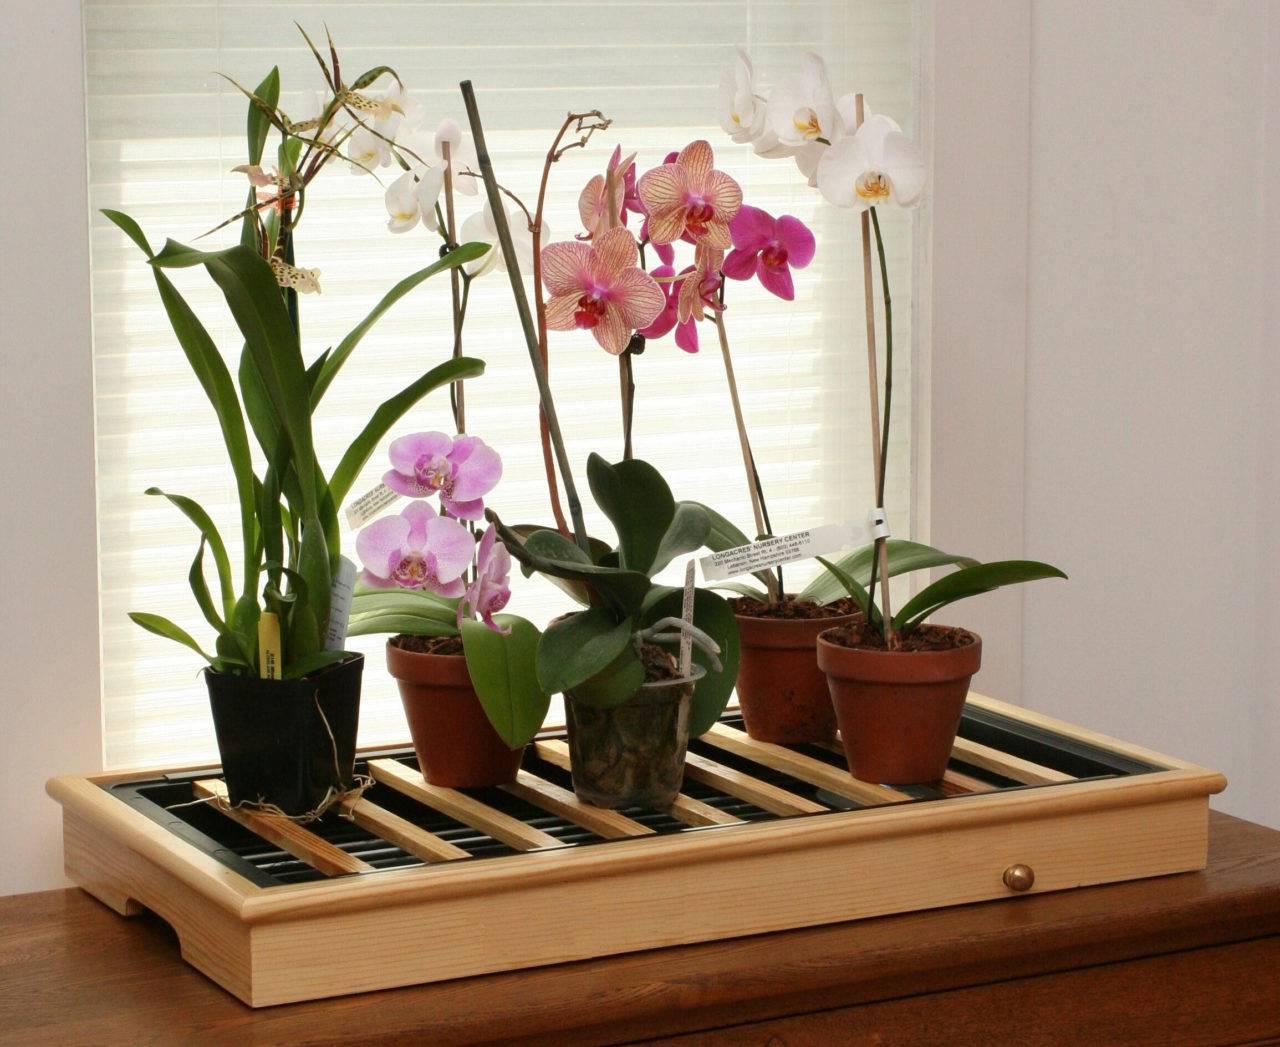 Орхидея: уход в домашних условиях после покупки фото видео